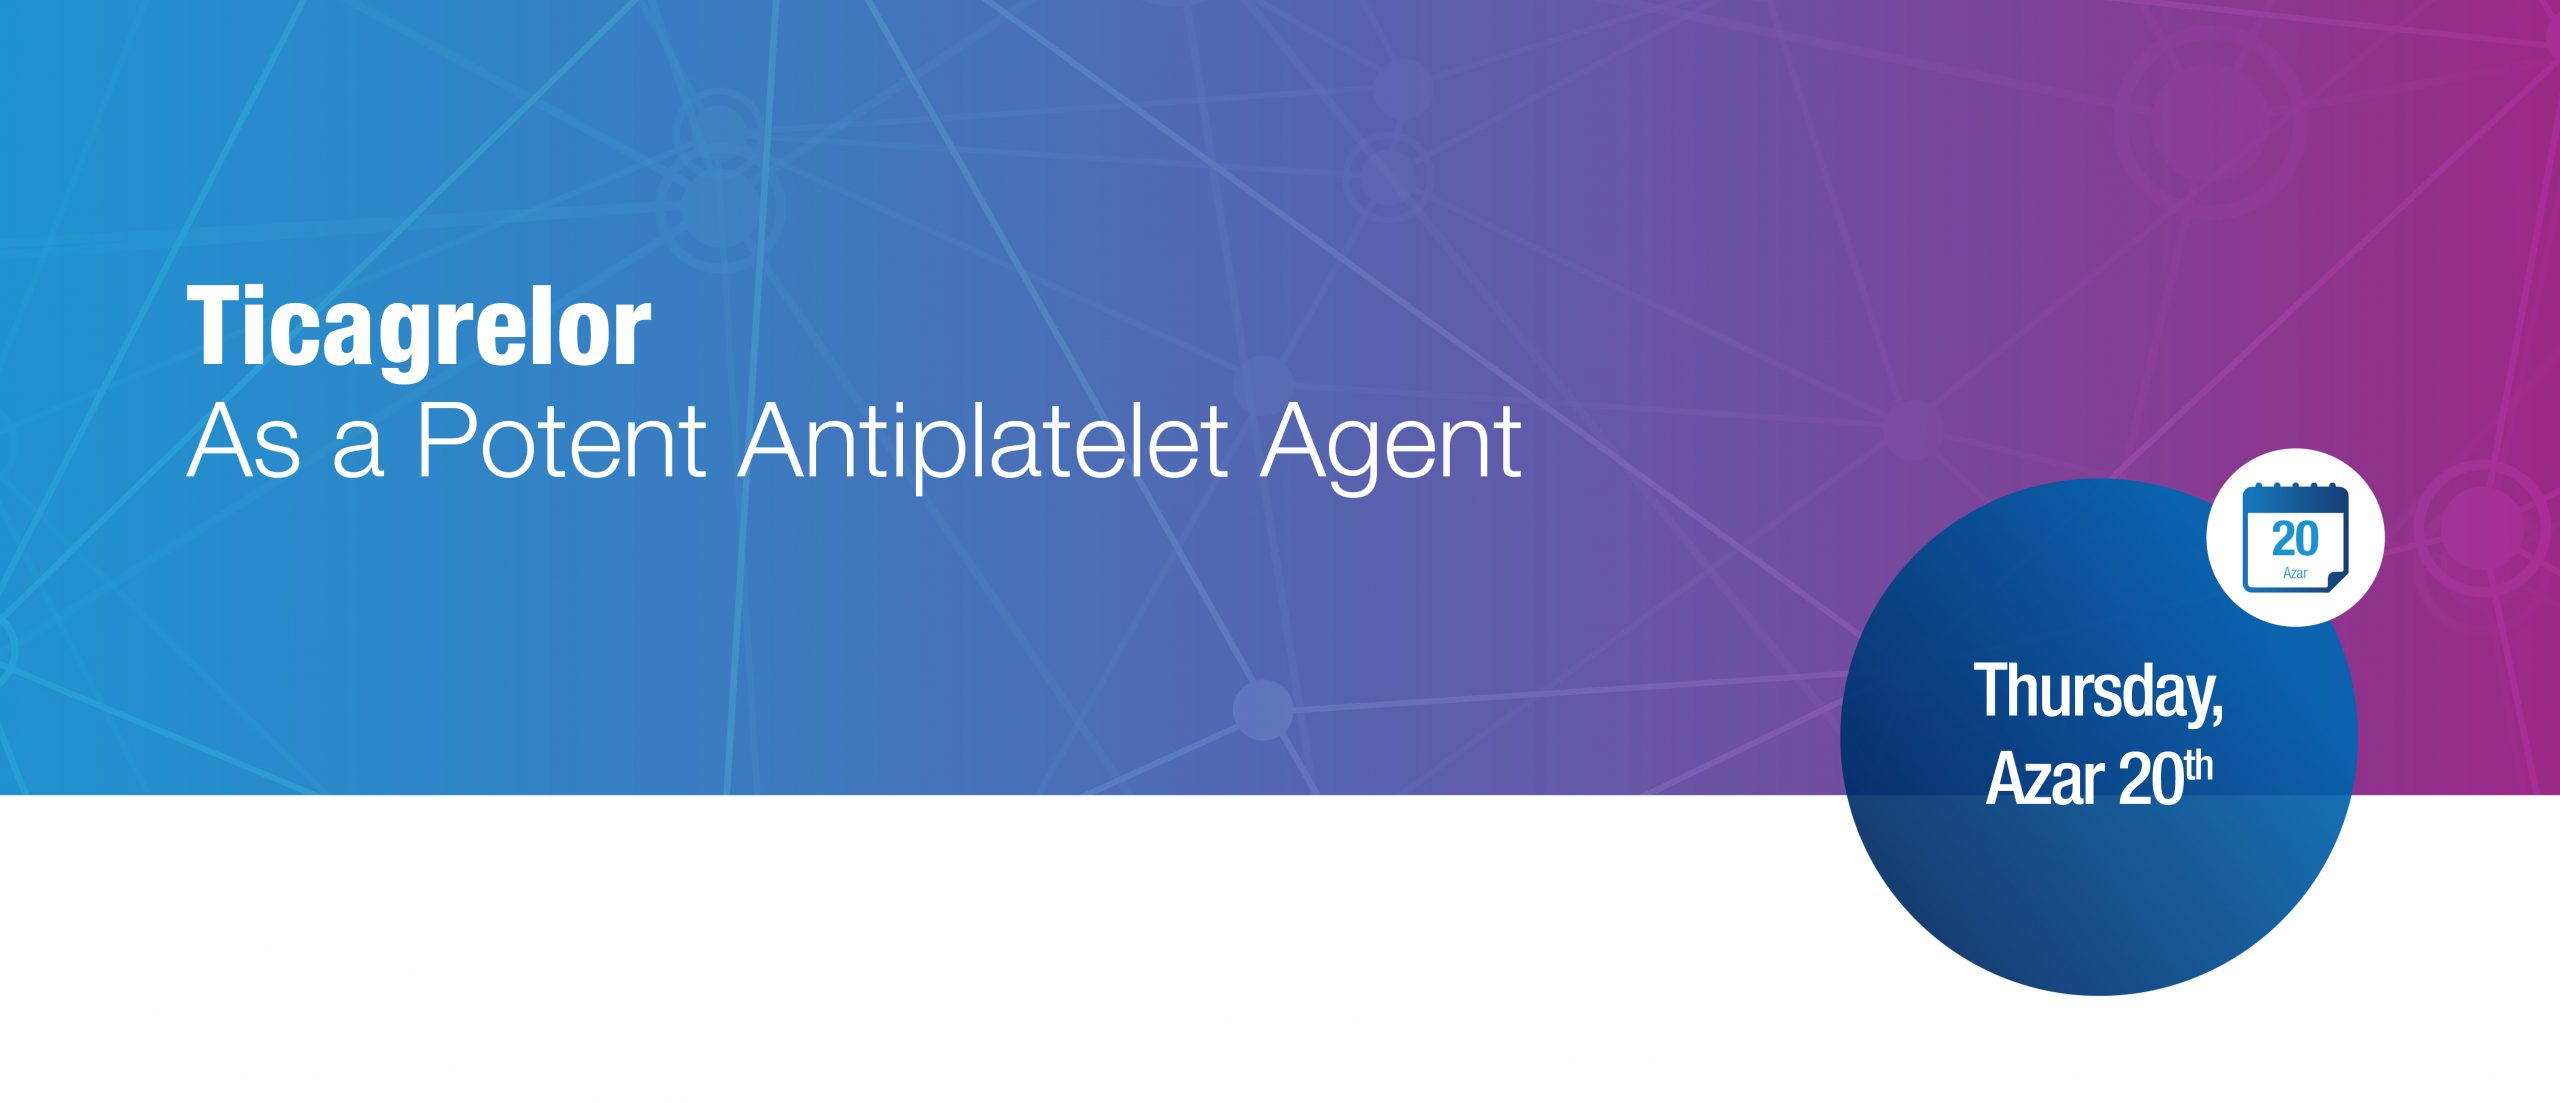 Ticagrelor, As a Potent Antiplatelet Agent